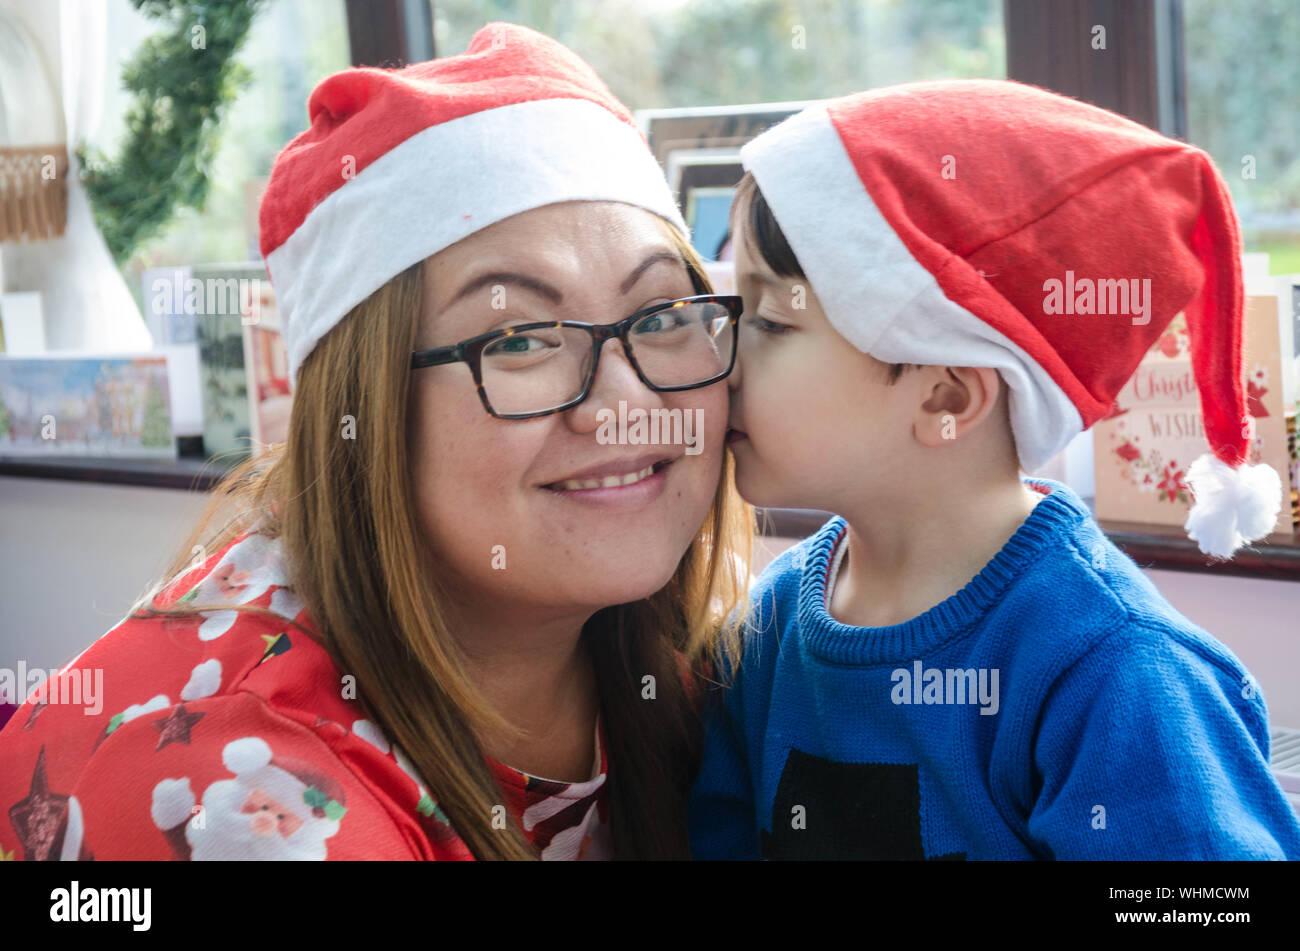 son-kissing-mother-during-christmas-WHMCWM.jpg